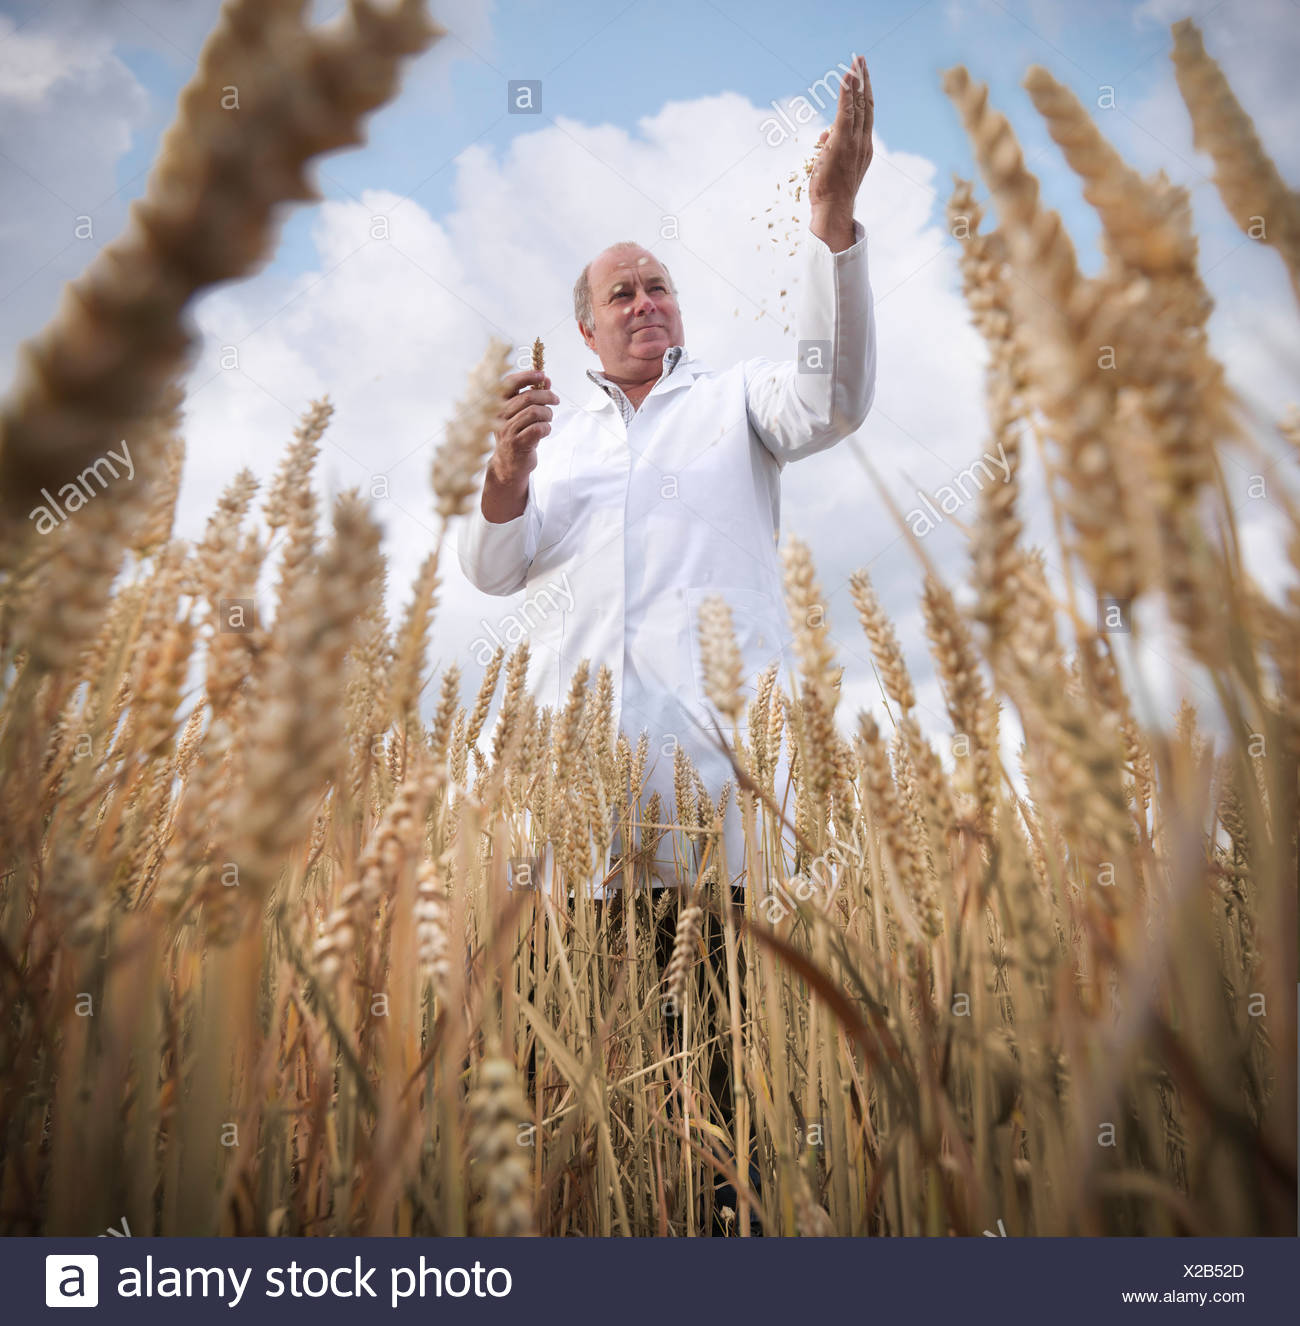 Scientist examining wheat grain in field - Stock Image